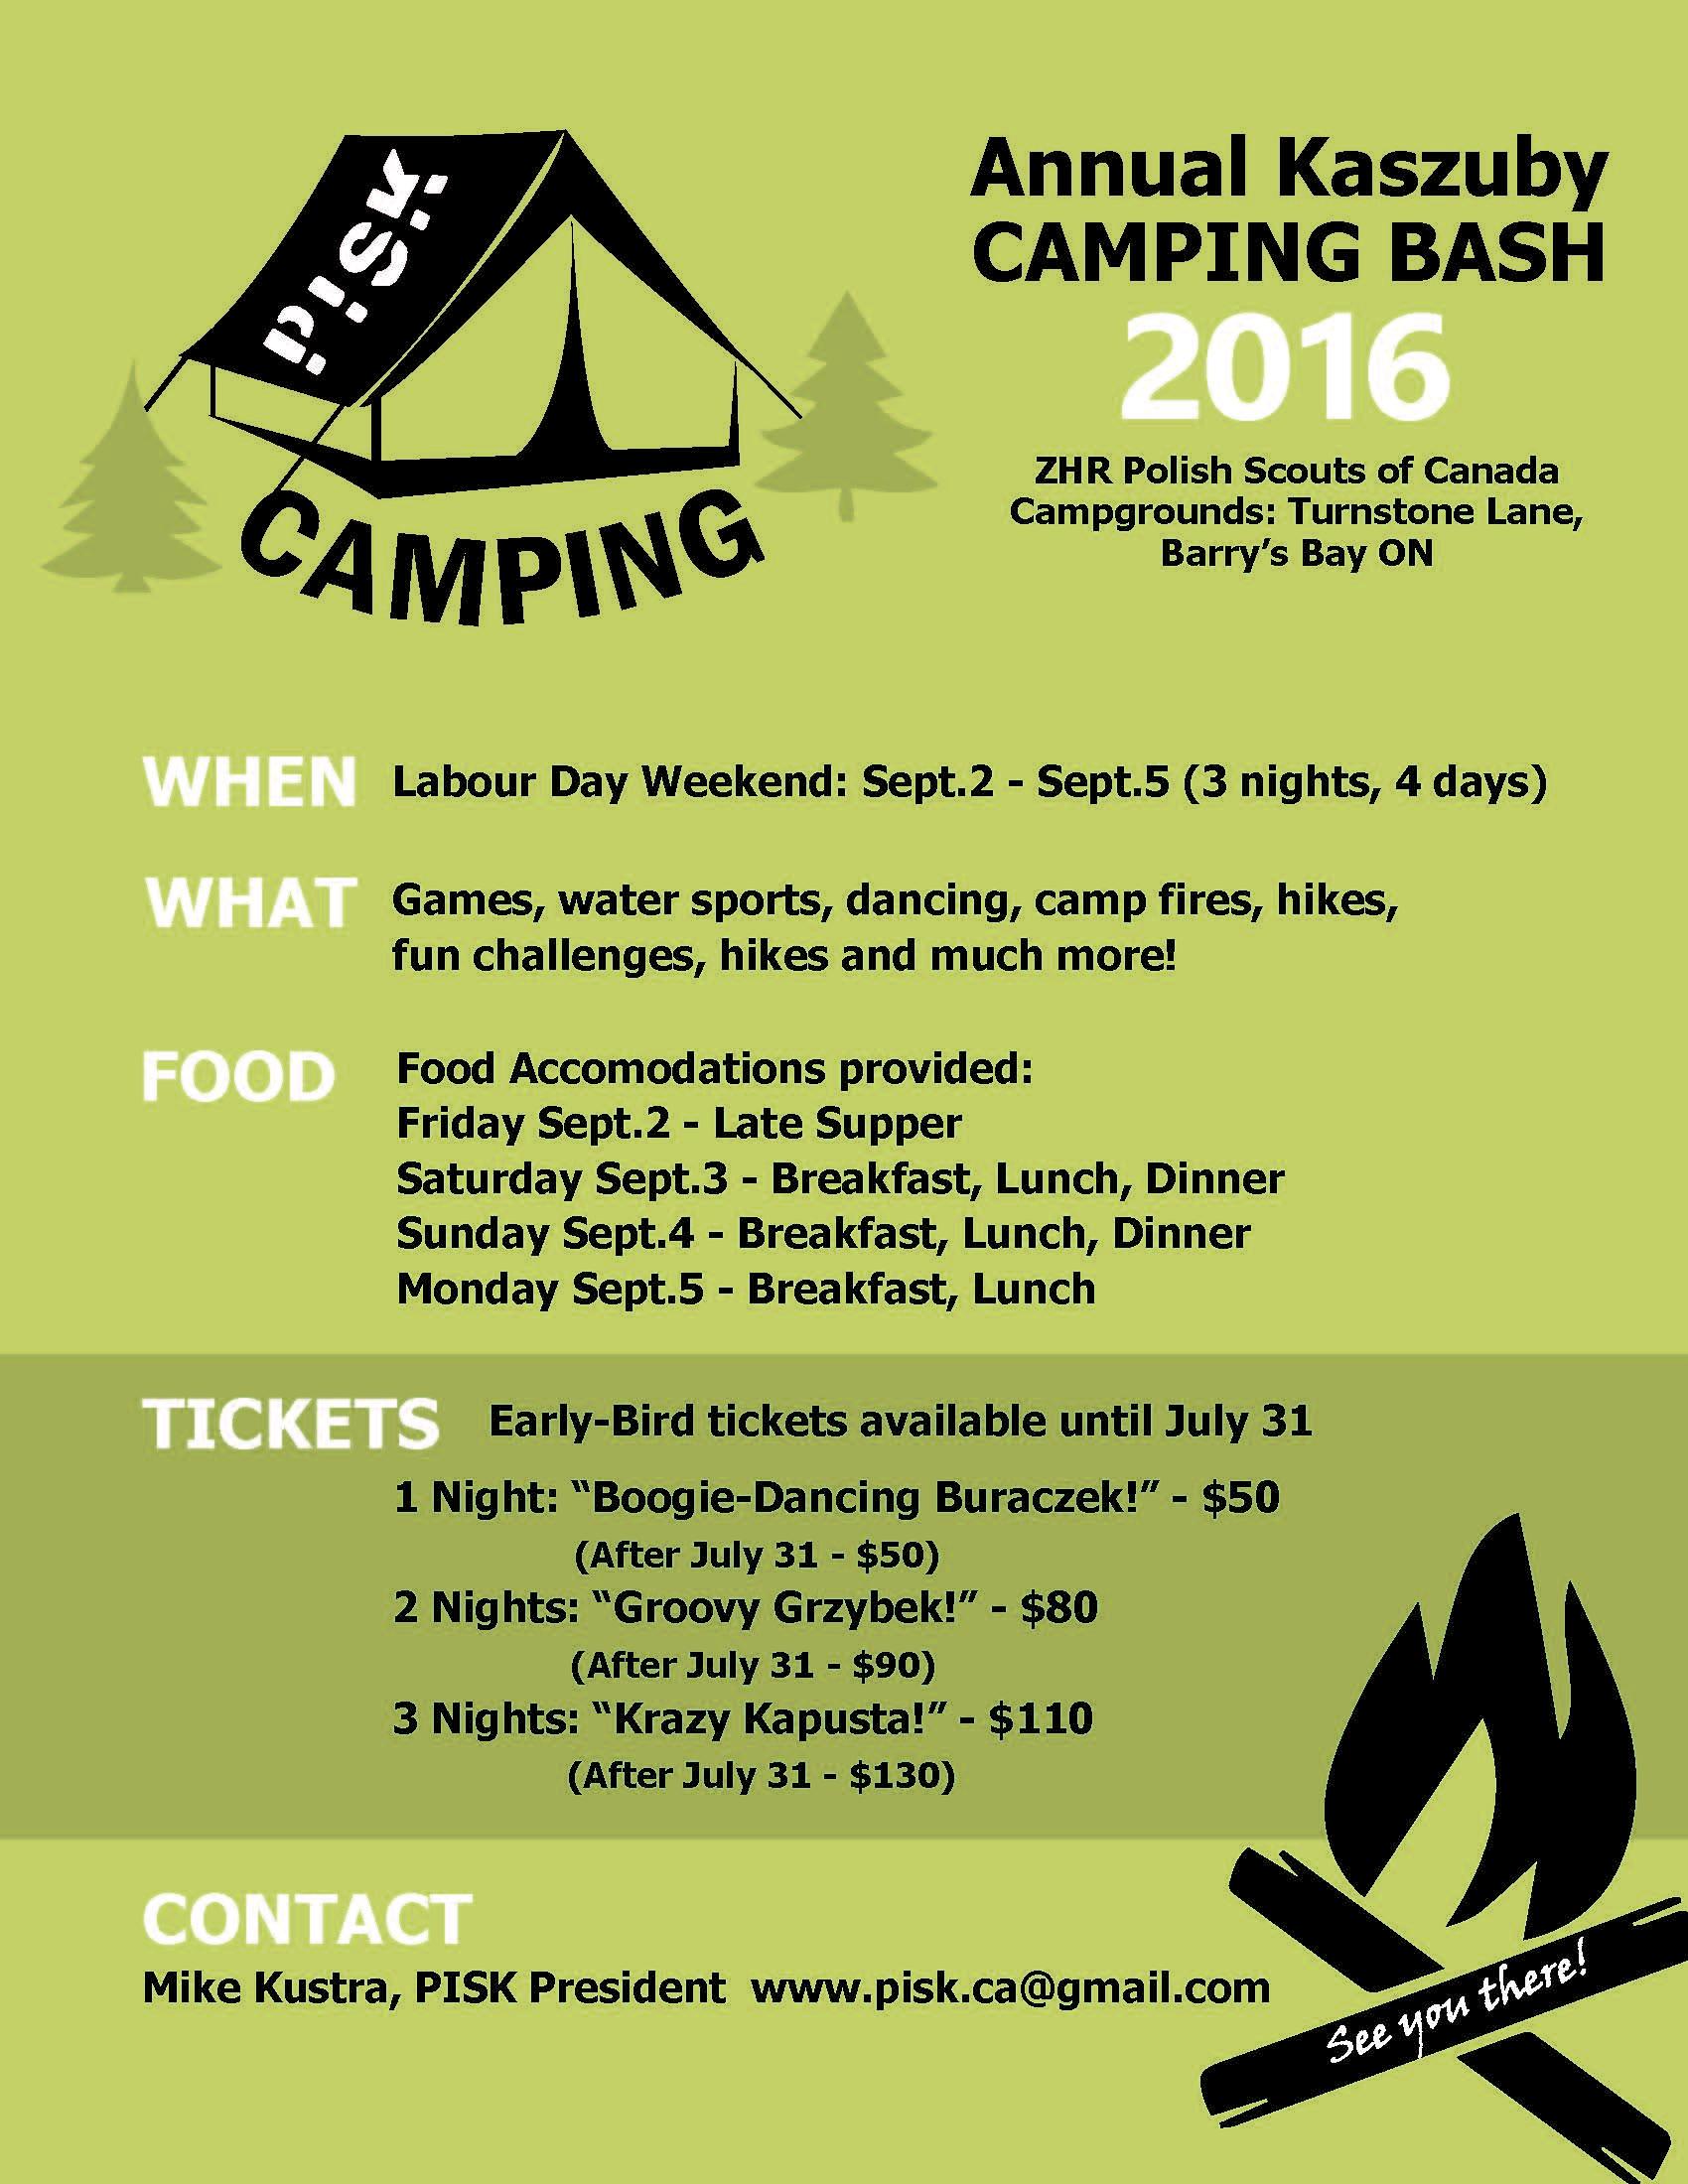 PISK Camping 2016